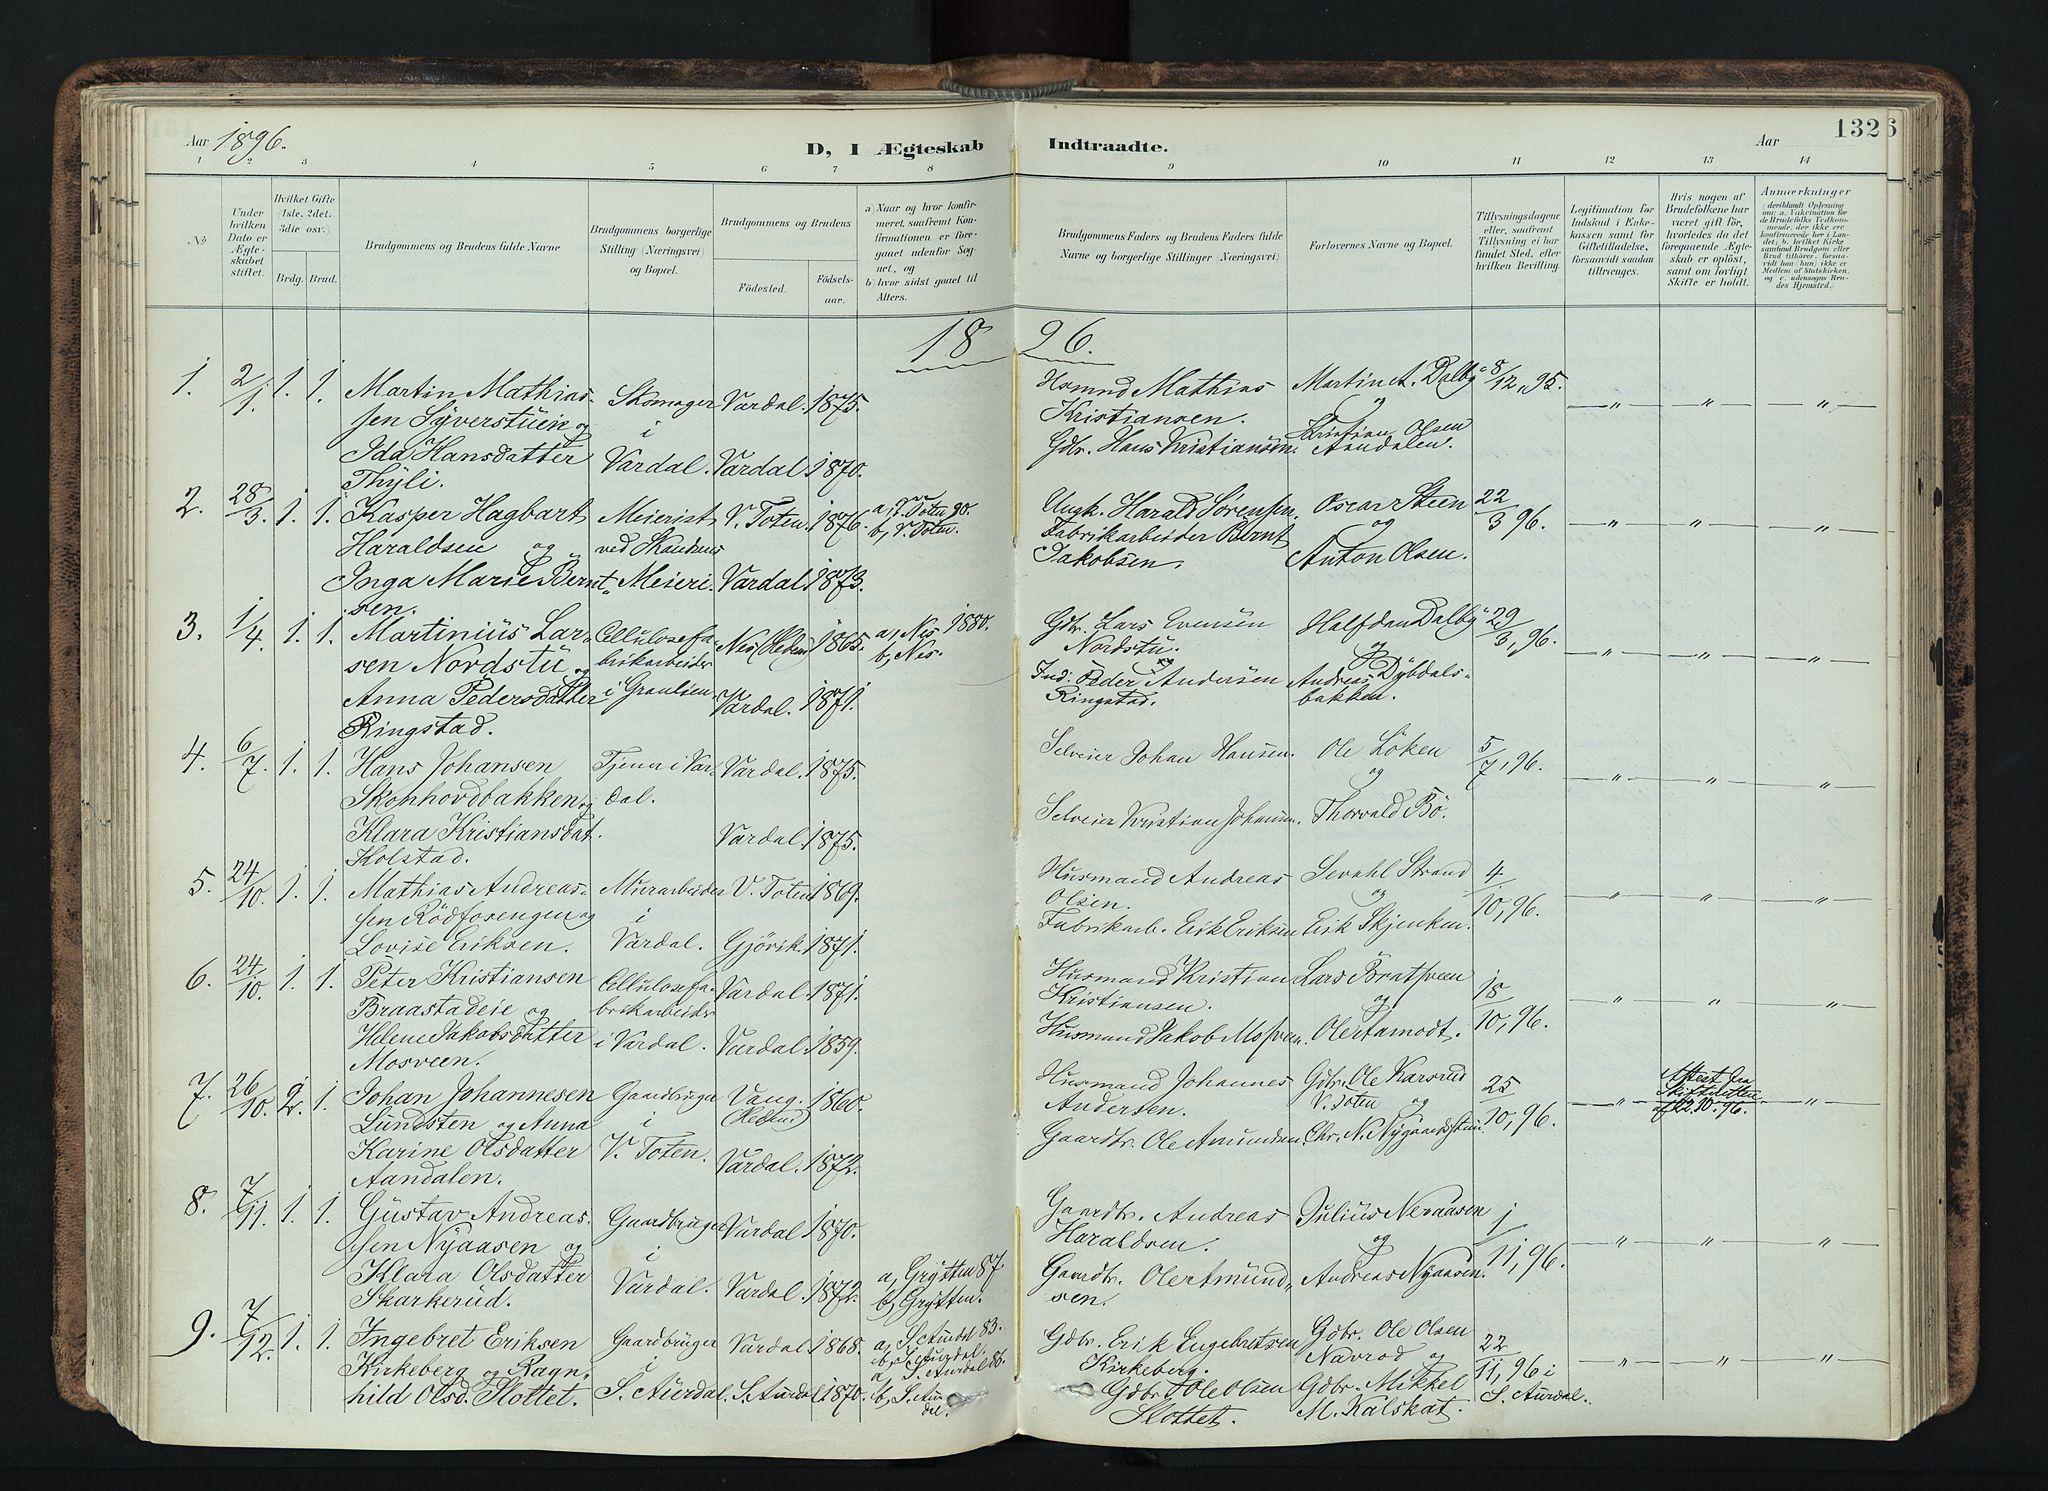 SAH, Vardal prestekontor, H/Ha/Haa/L0019: Ministerialbok nr. 19, 1893-1907, s. 132